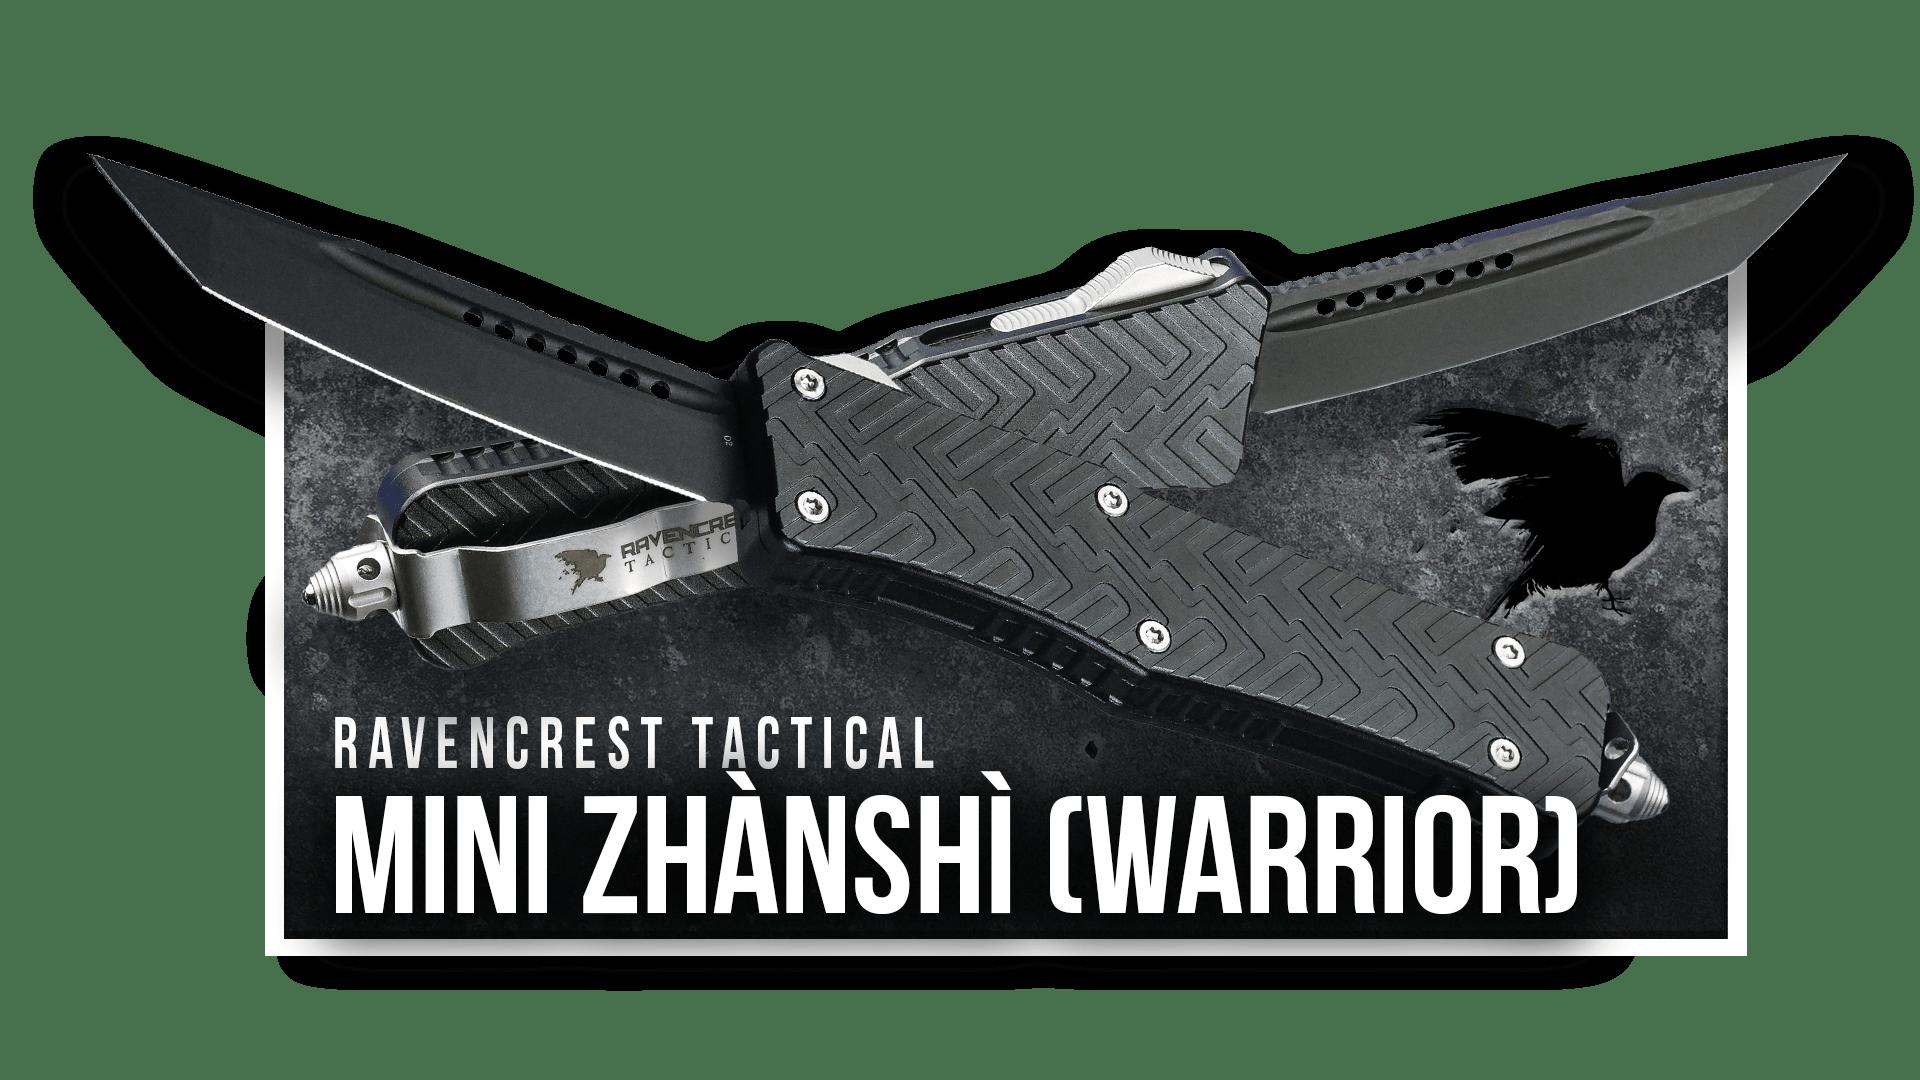 OTF Knife - Mini Zhanshi - RavenCrest Tactical